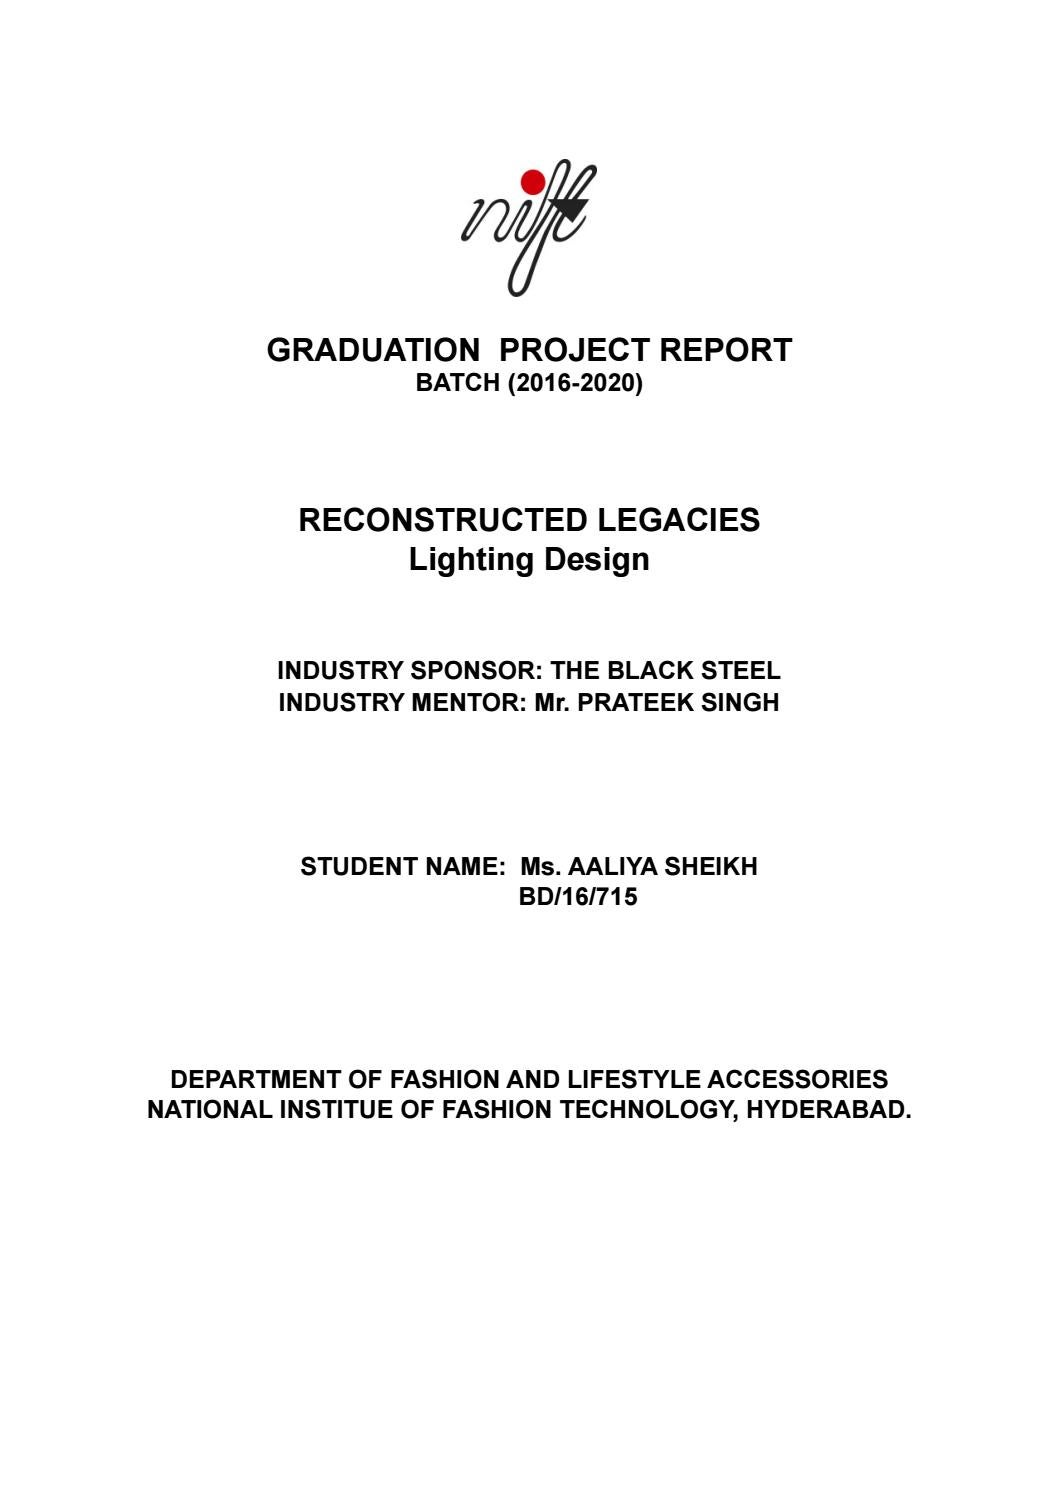 Nift Graduation Project Document By Aaliya Sheikh Issuu